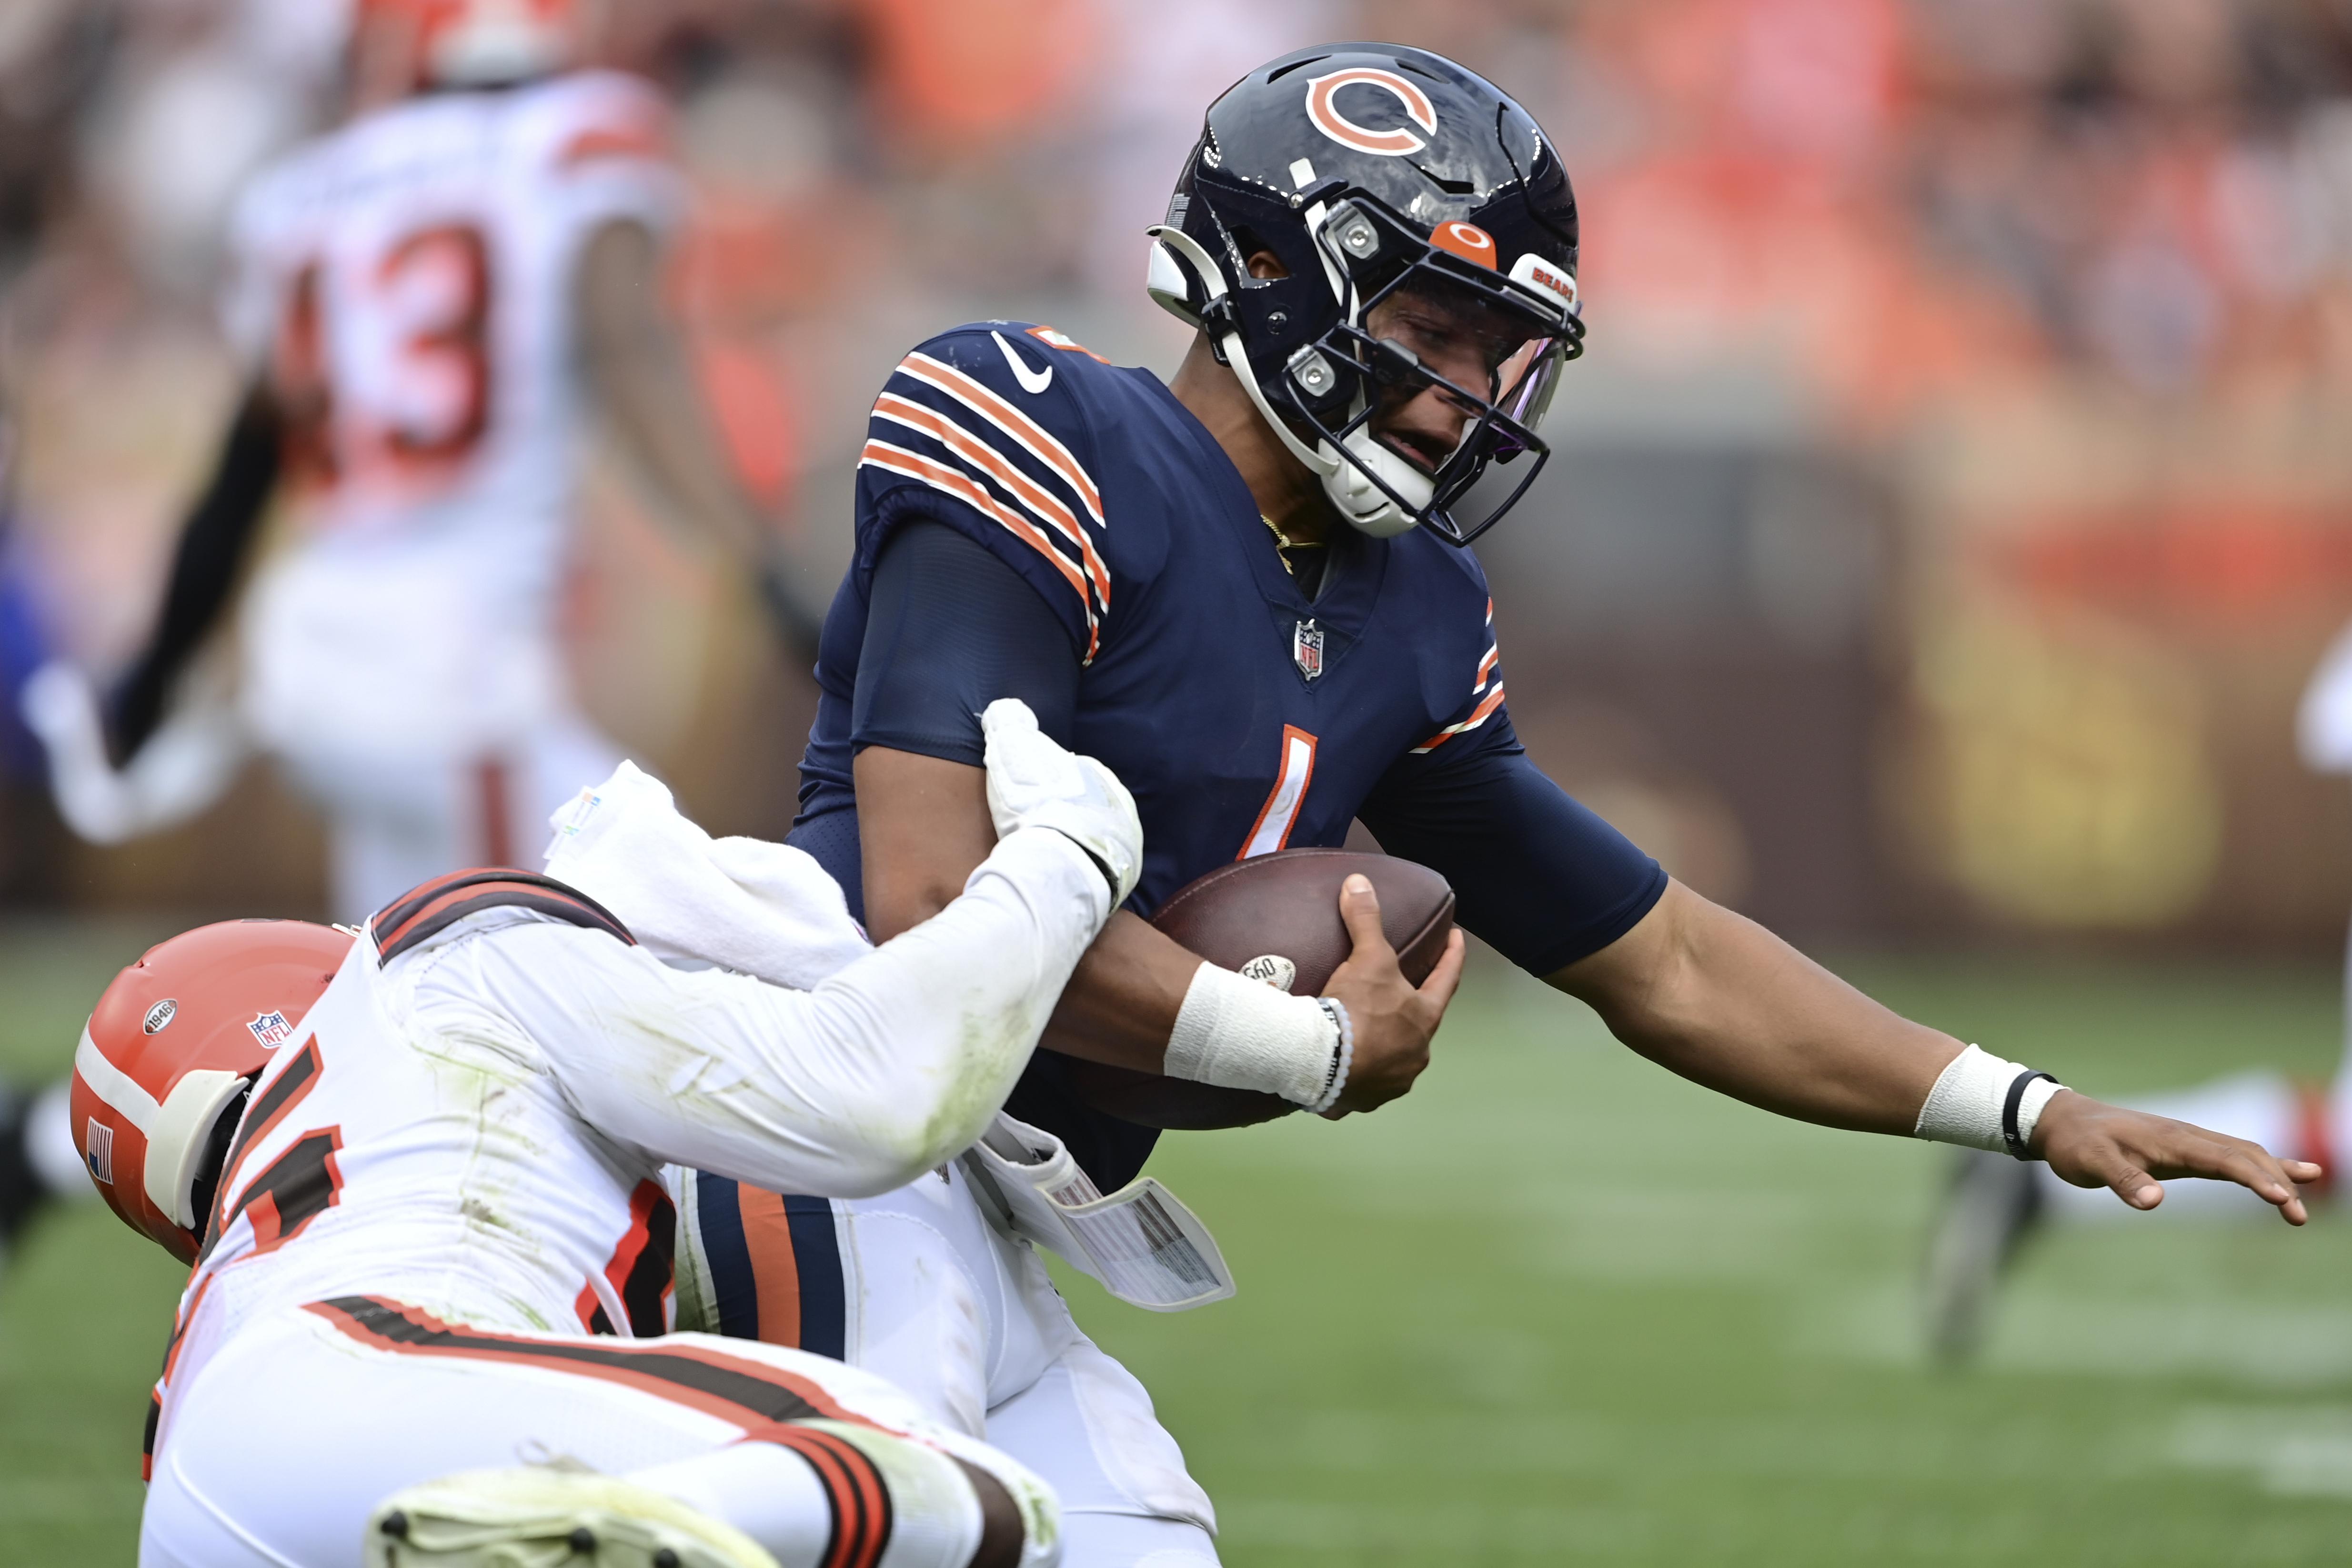 Browns defensive end Myles Garrett, left, makes one of his 4.5 sacks against Bears quarterback Justin Fields.